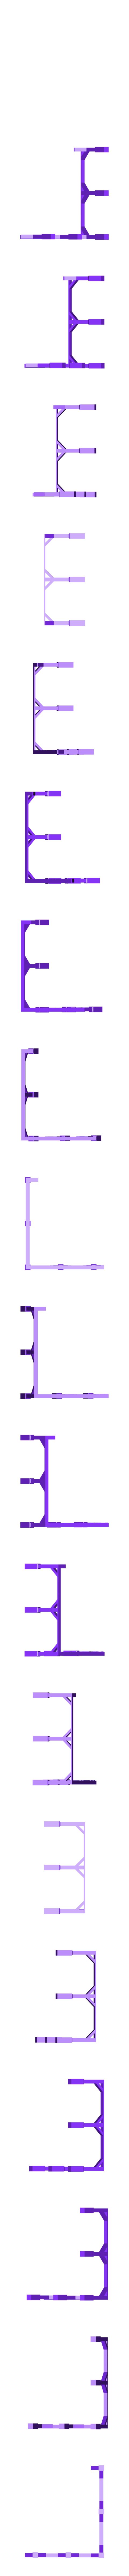 Pillars.stl Download free STL file HO Scale Two Story Farmhouse • Model to 3D print, kabrumble